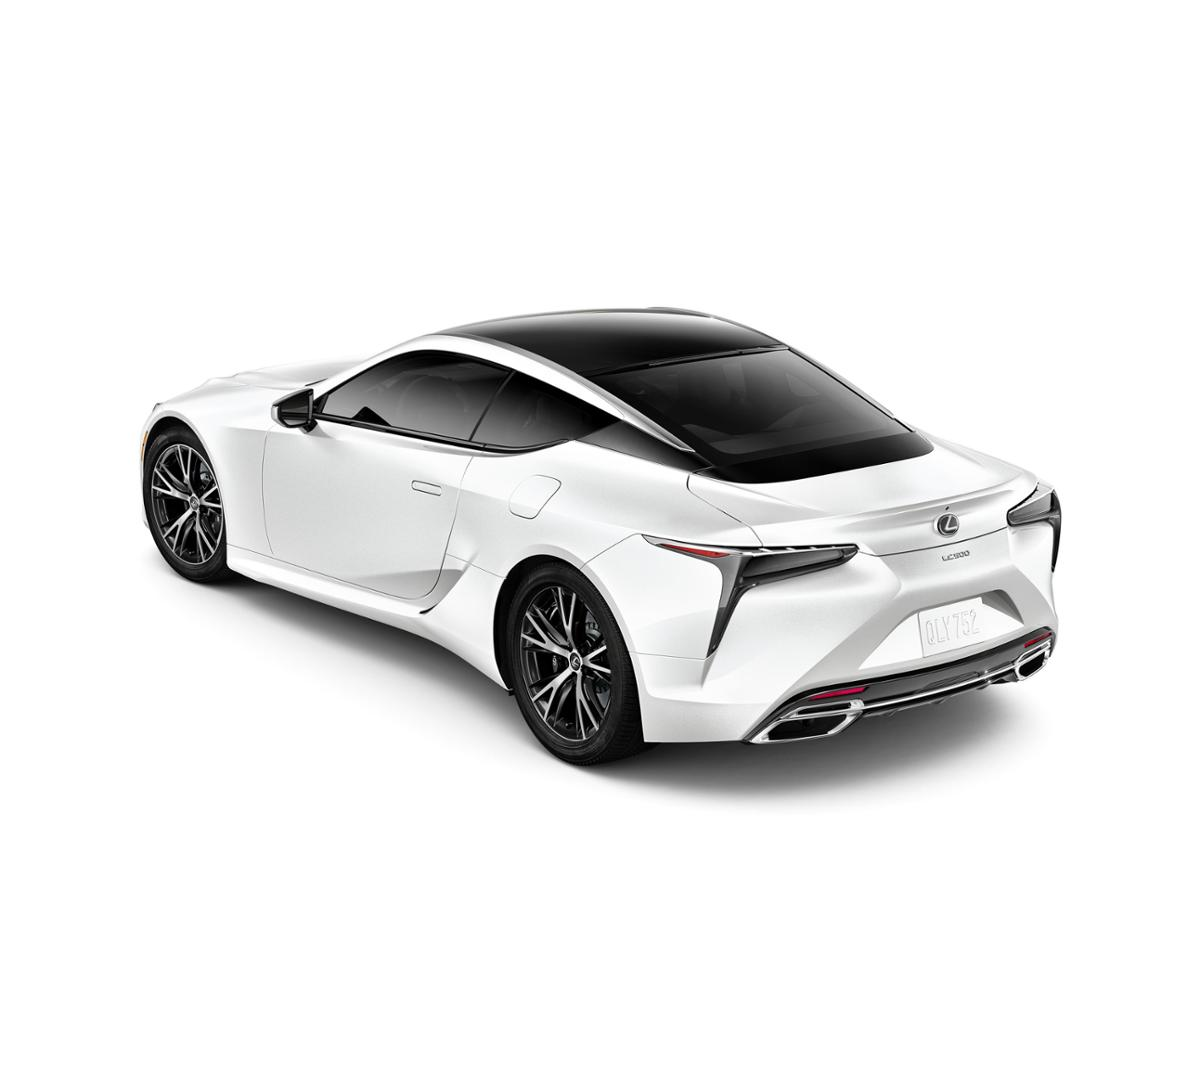 Lexus Dealership Dallas >> Dallas Certified 2018 Lexus LC 500 Ultra White: Car for Sale - JTHHP5AY7JA003858